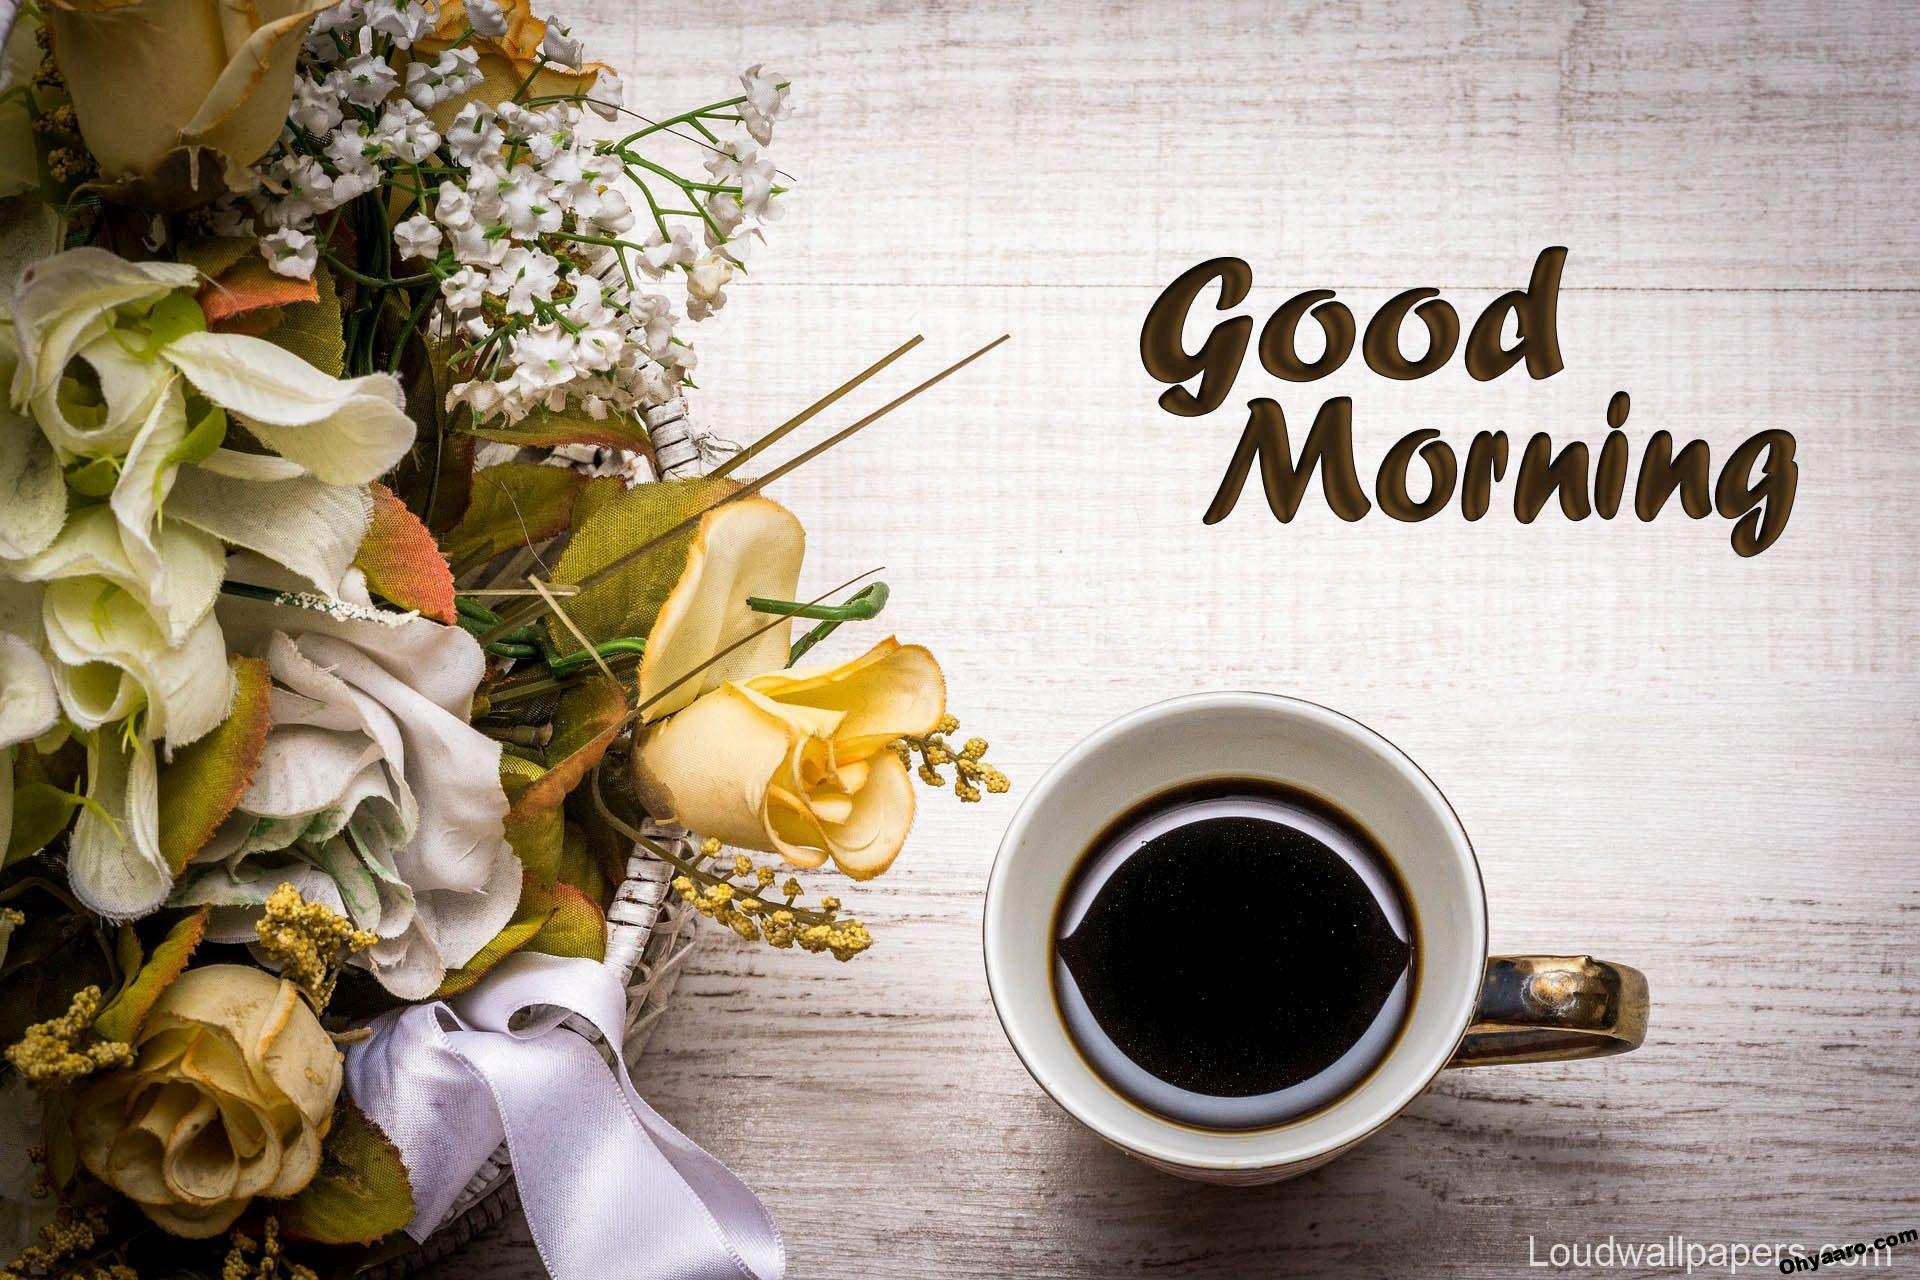 Good Morning Wallpaper Images Download